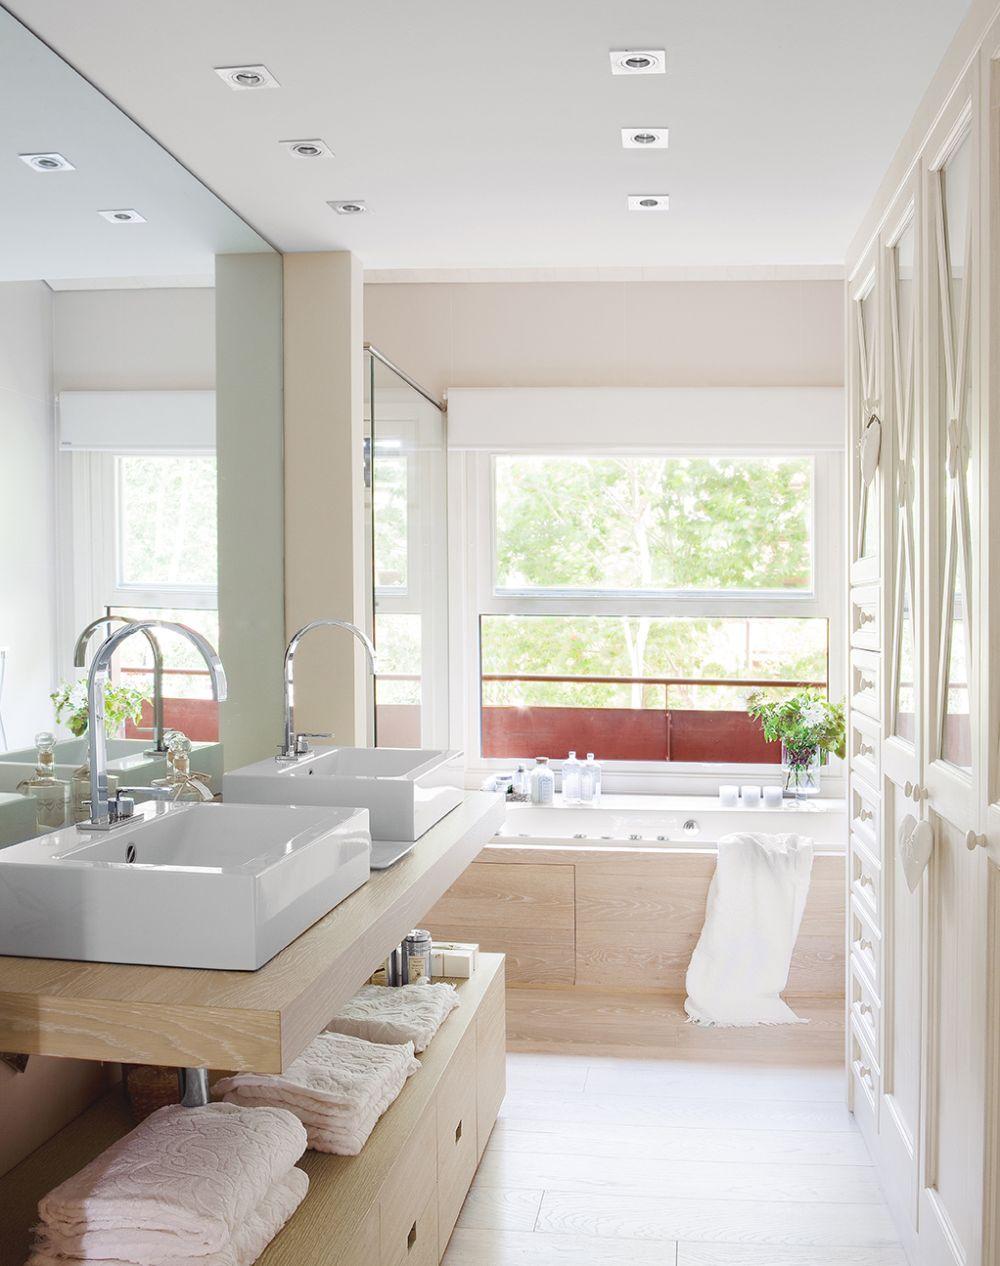 adelaparvu.com despre casa cu interior romantic modern, decorator Asun Anto, arhitect Fernando Agusti (12)